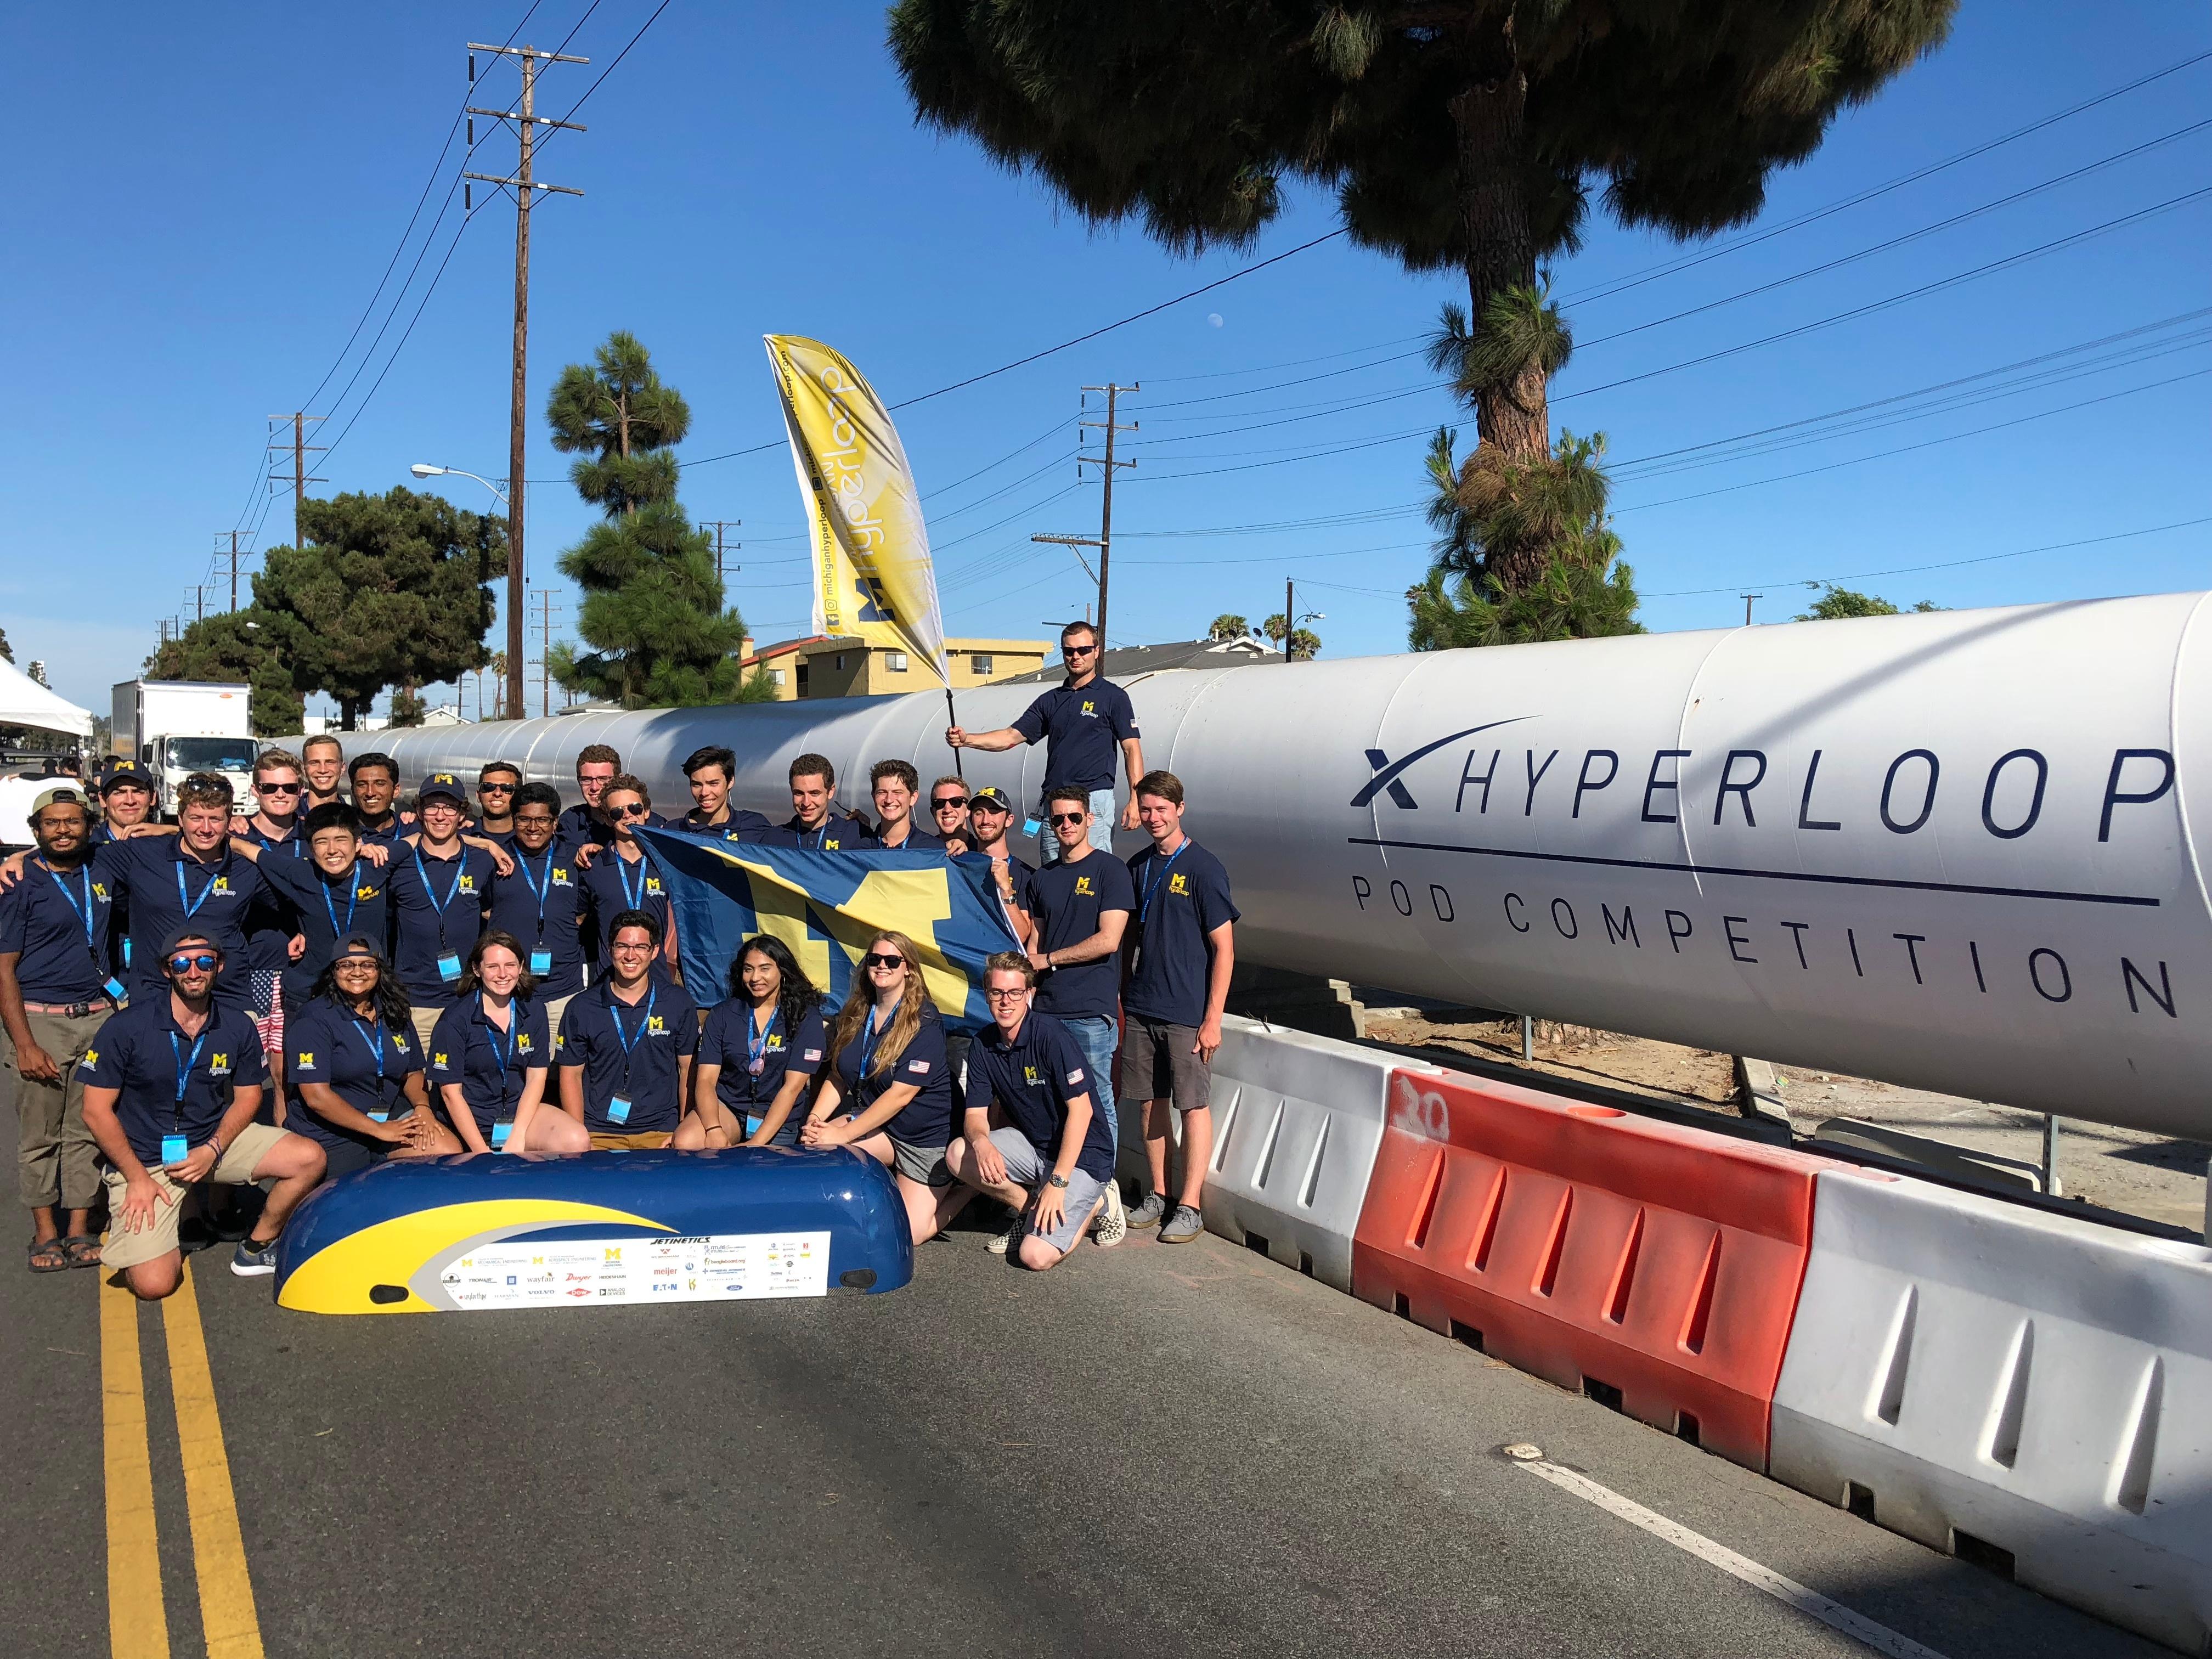 Michigan Hyperloop Team